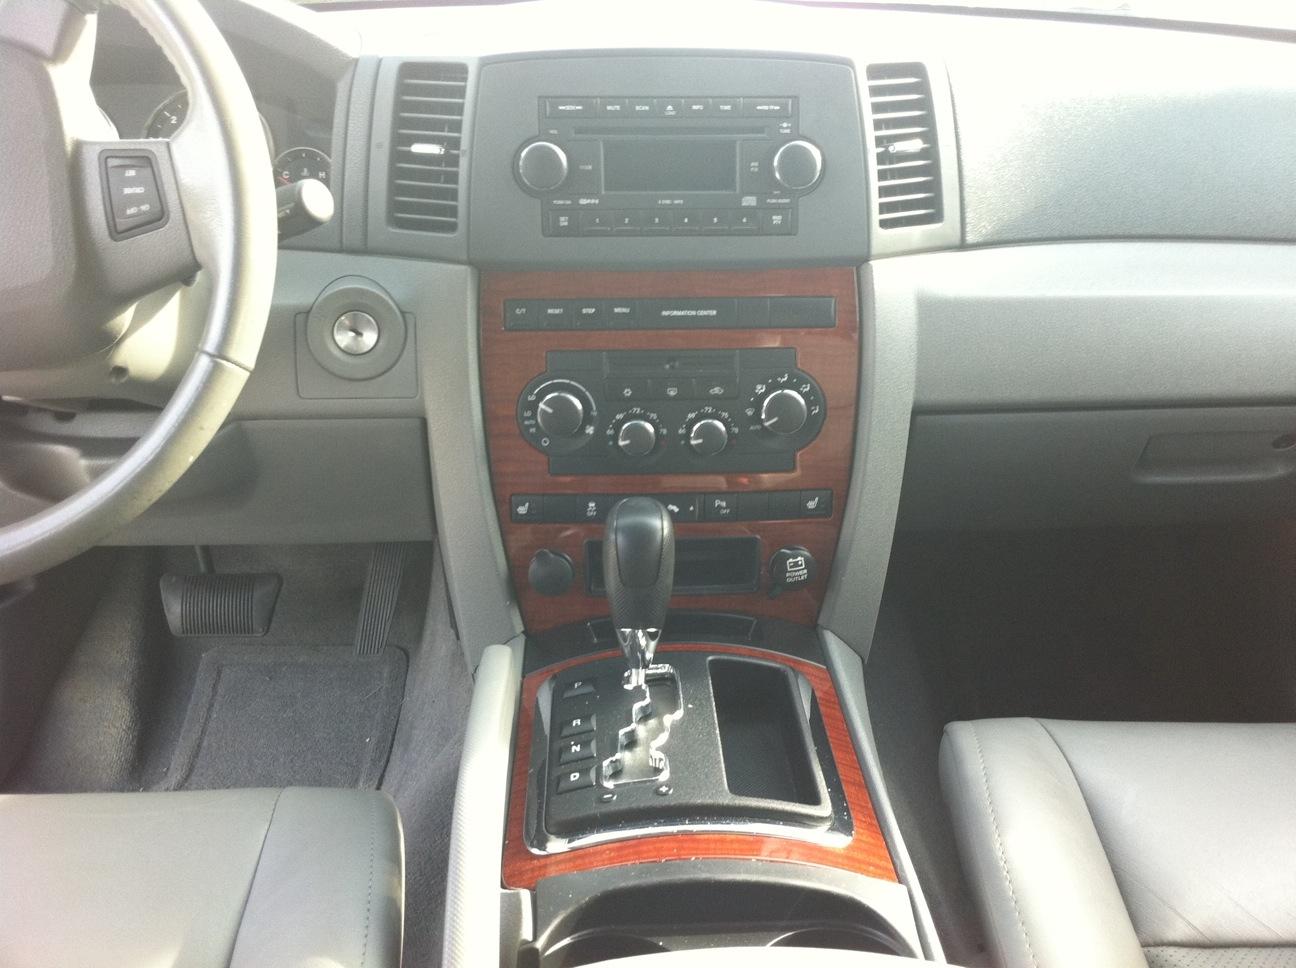 2006 Jeep Grand Cherokee - Interior Pictures - CarGurus